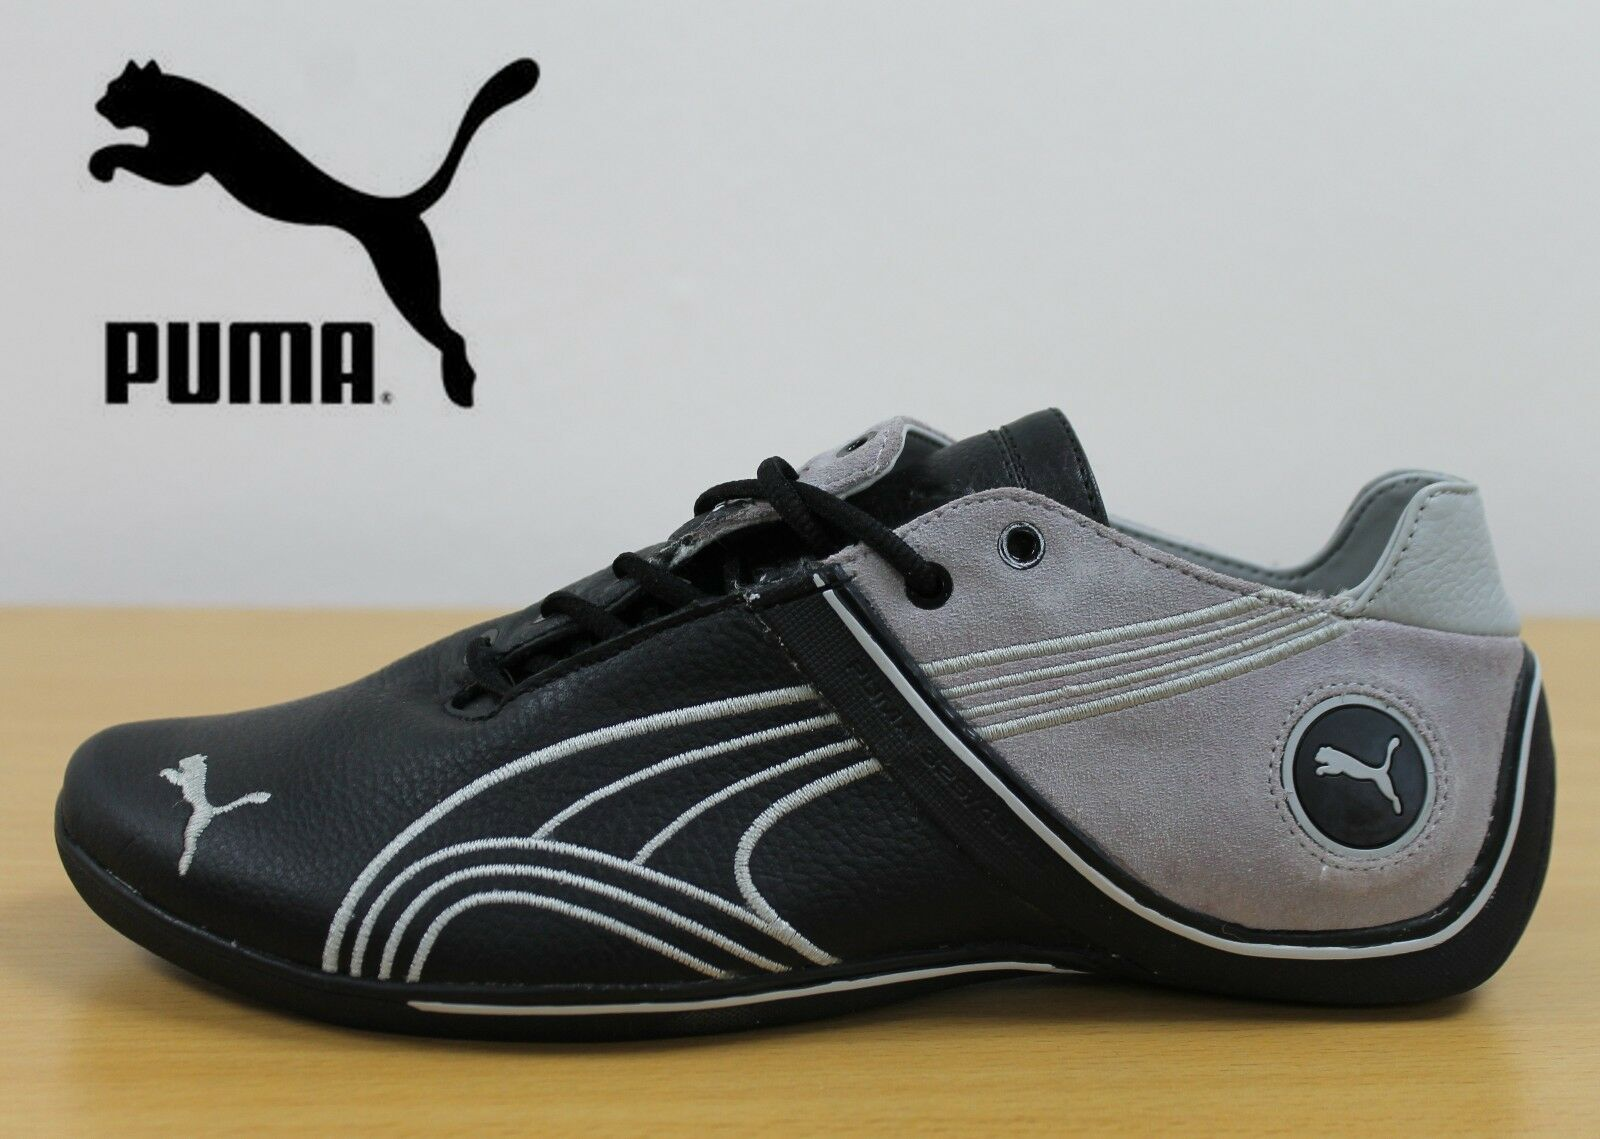 puma boys trainers